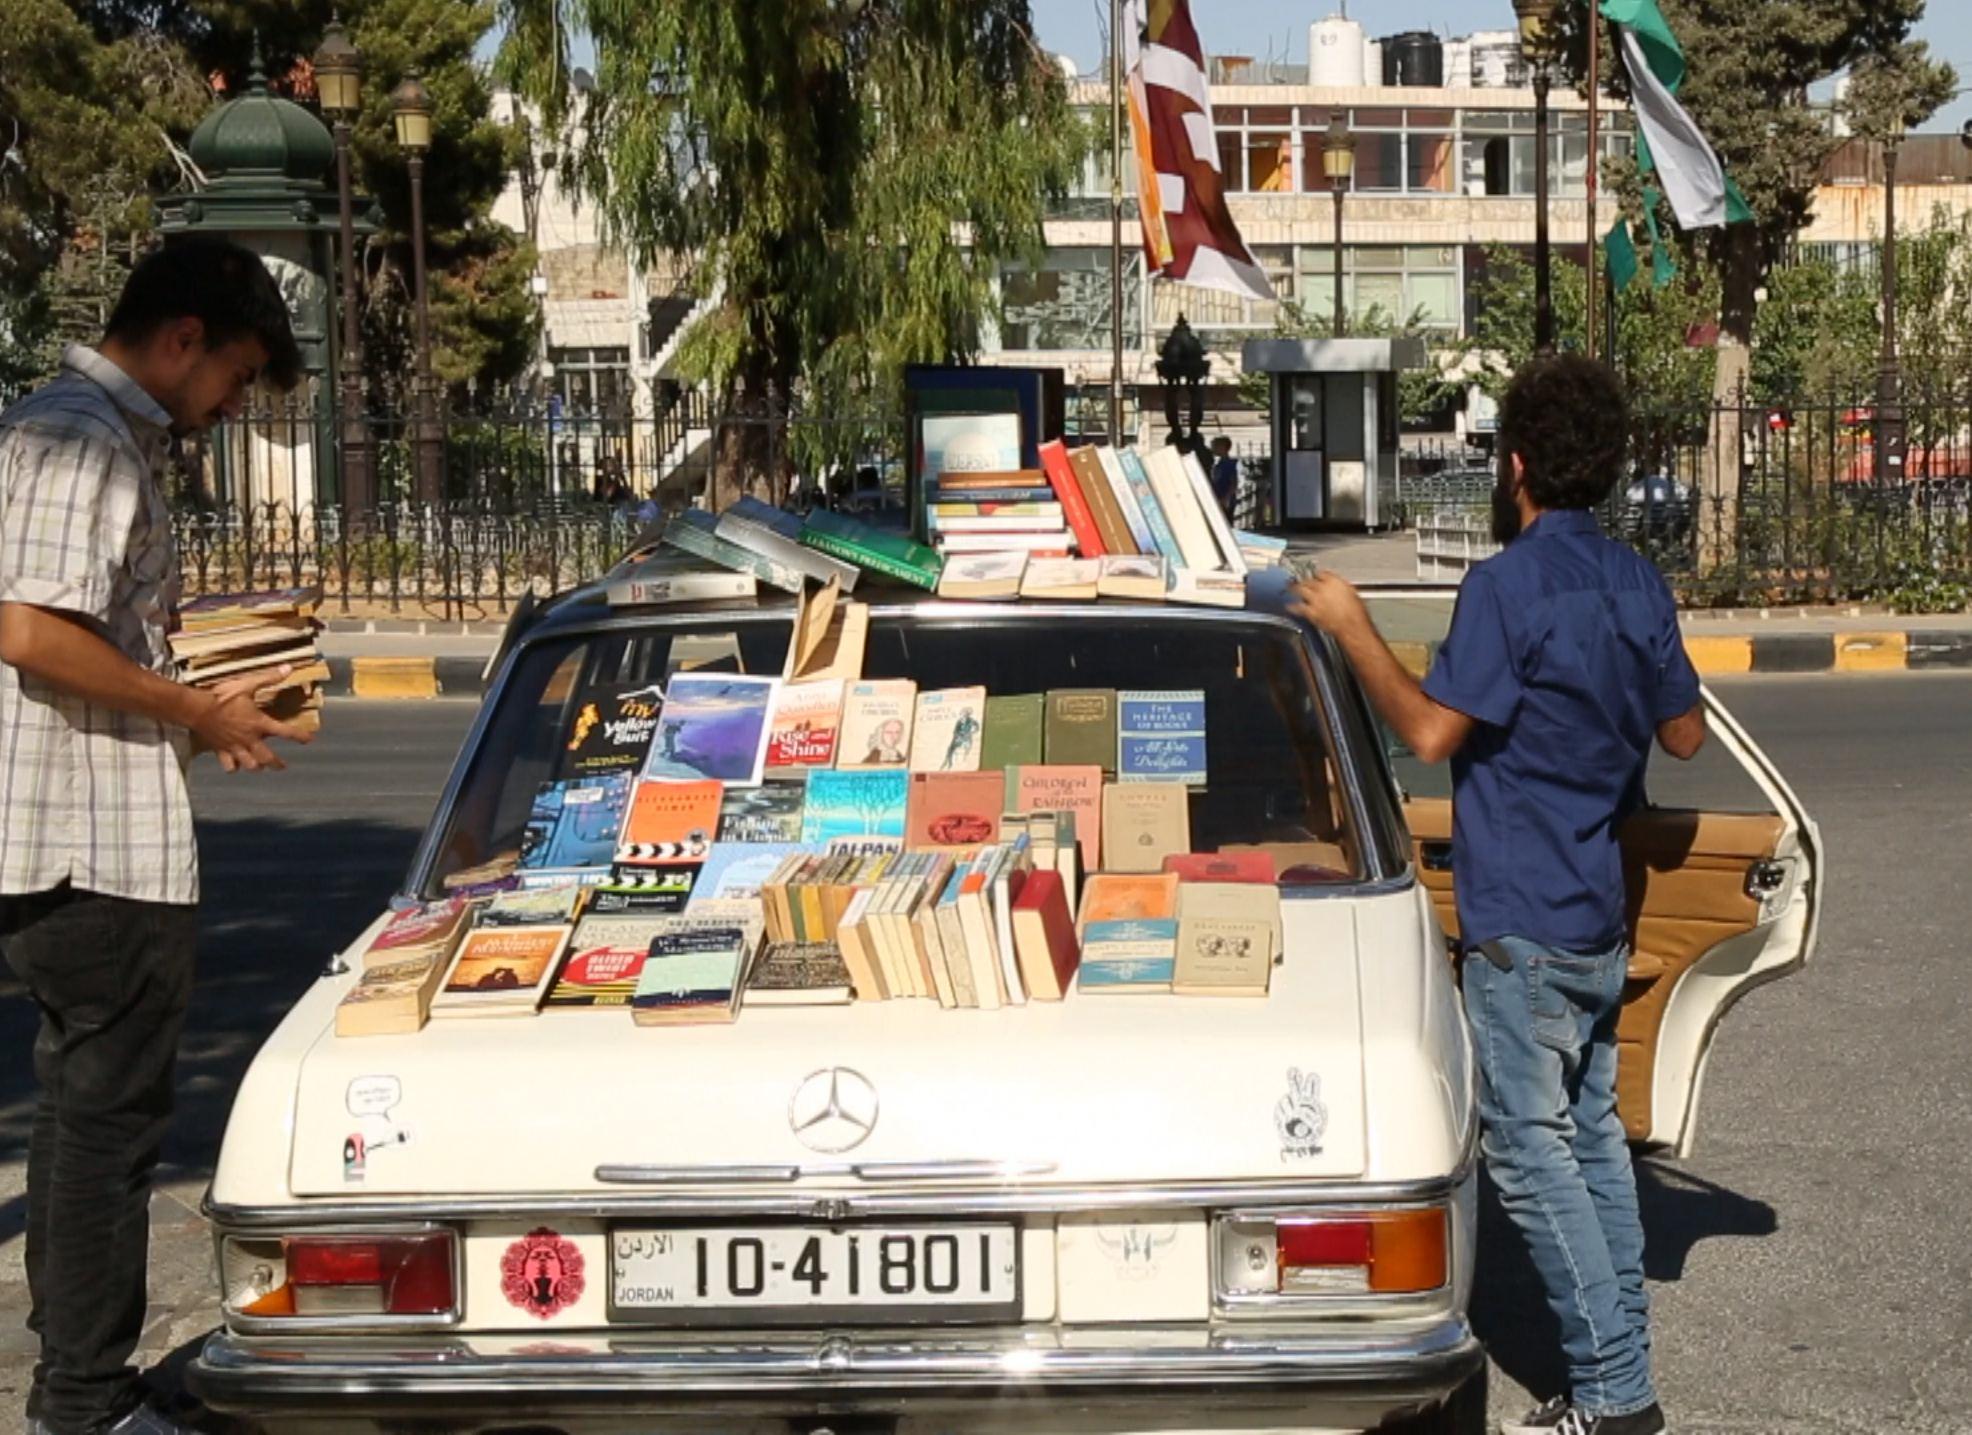 www.nsaem.net_1463_شاب-أردني-يوفر-كتبا-نادرة-عبر-مكتبة-متن_.jpg.jpg